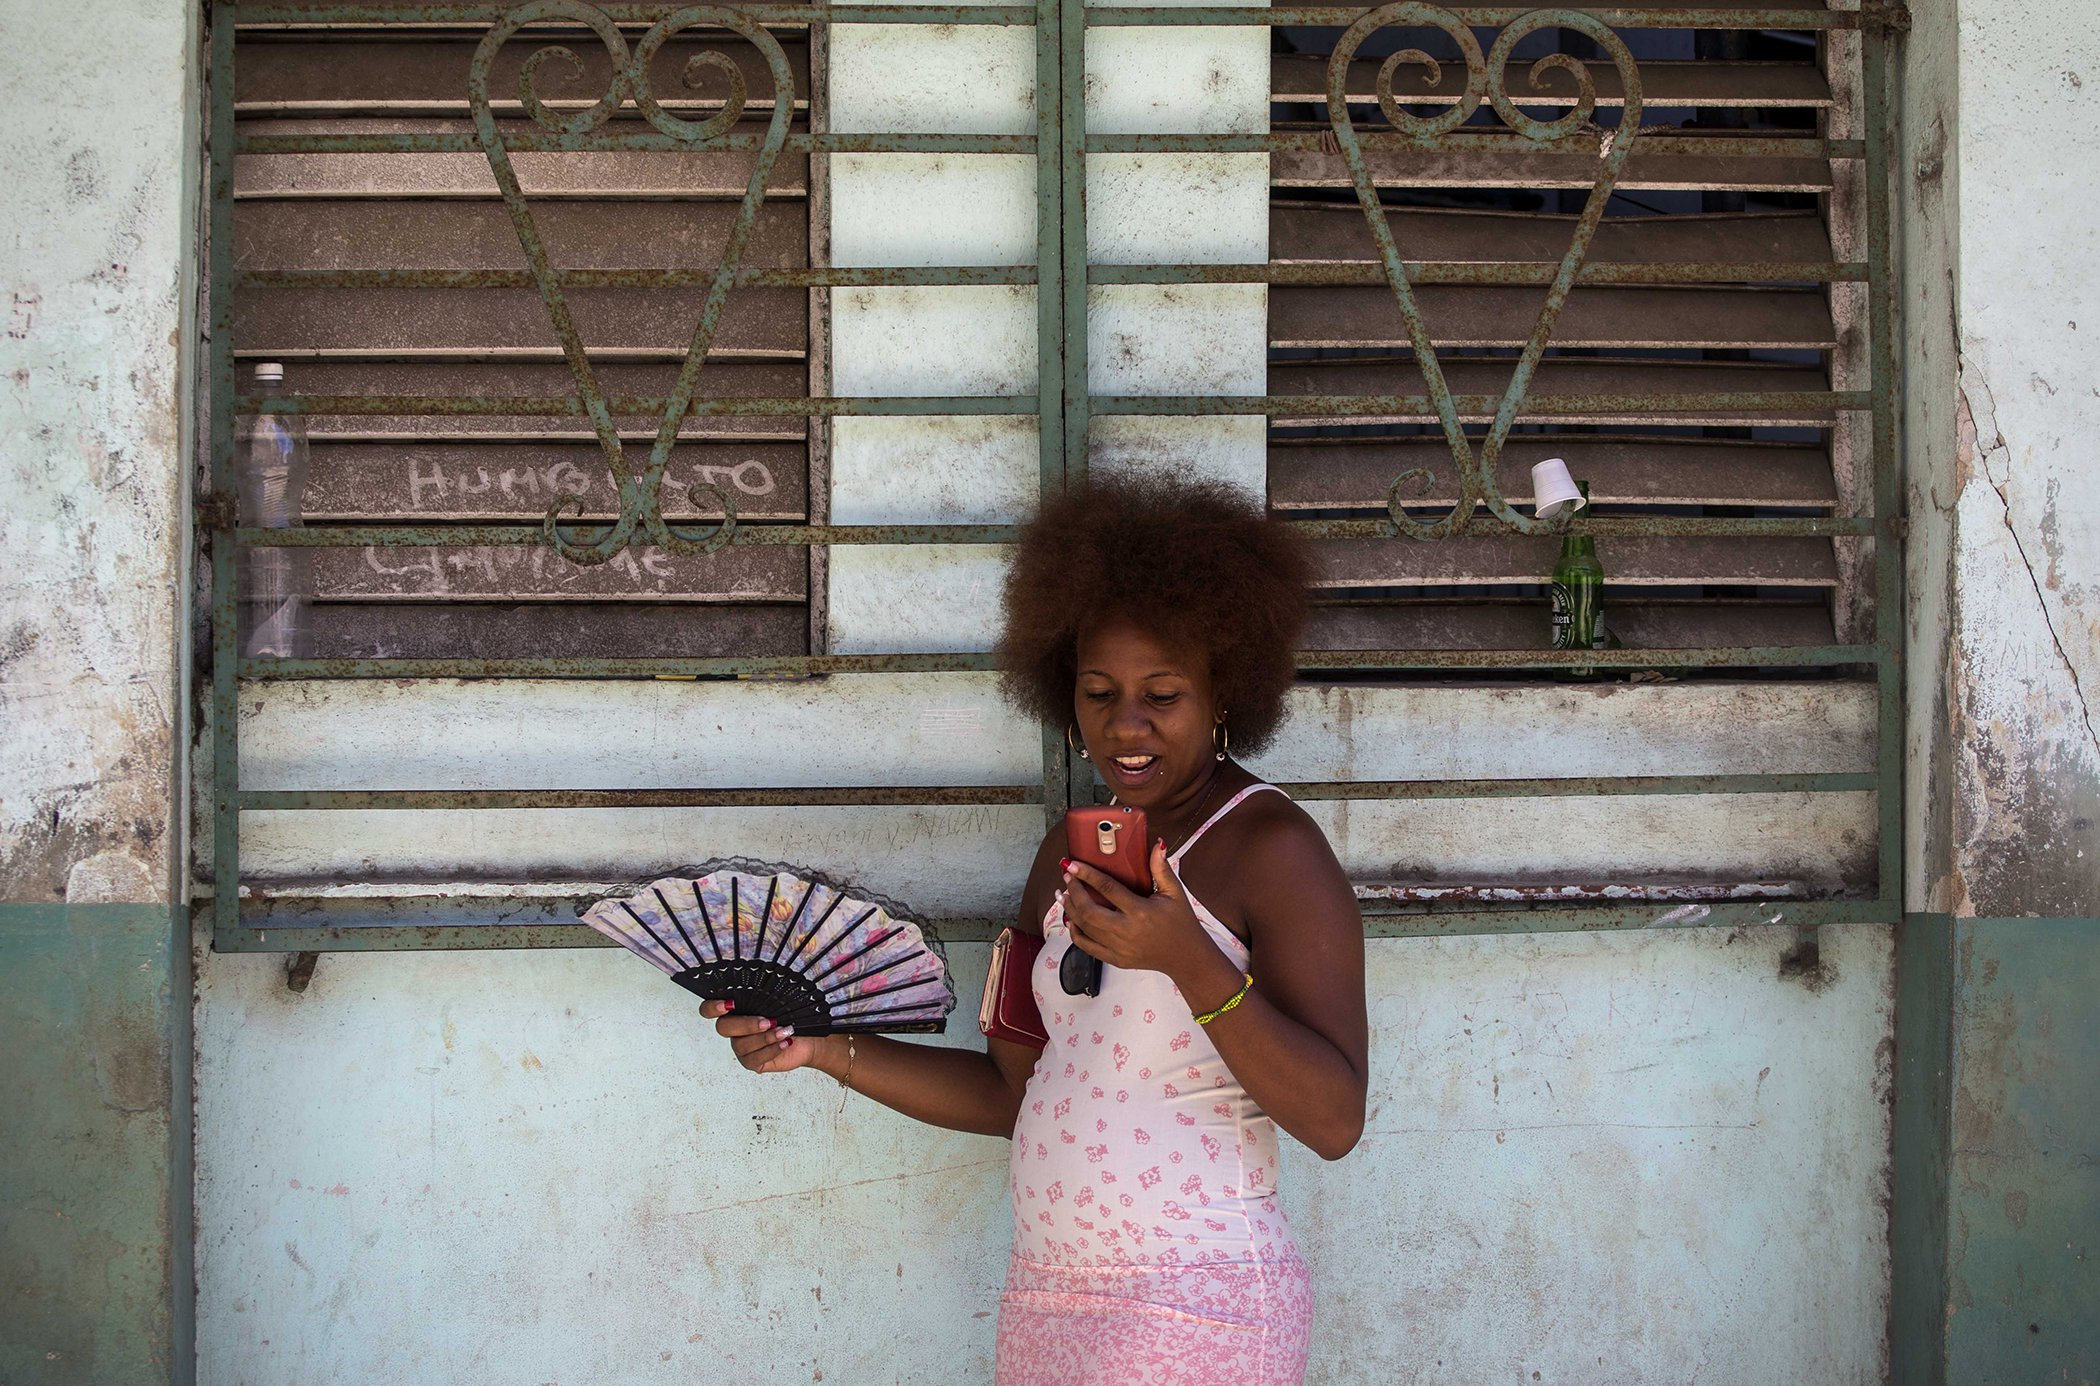 Cuba-Internet-Connectivity.jpg